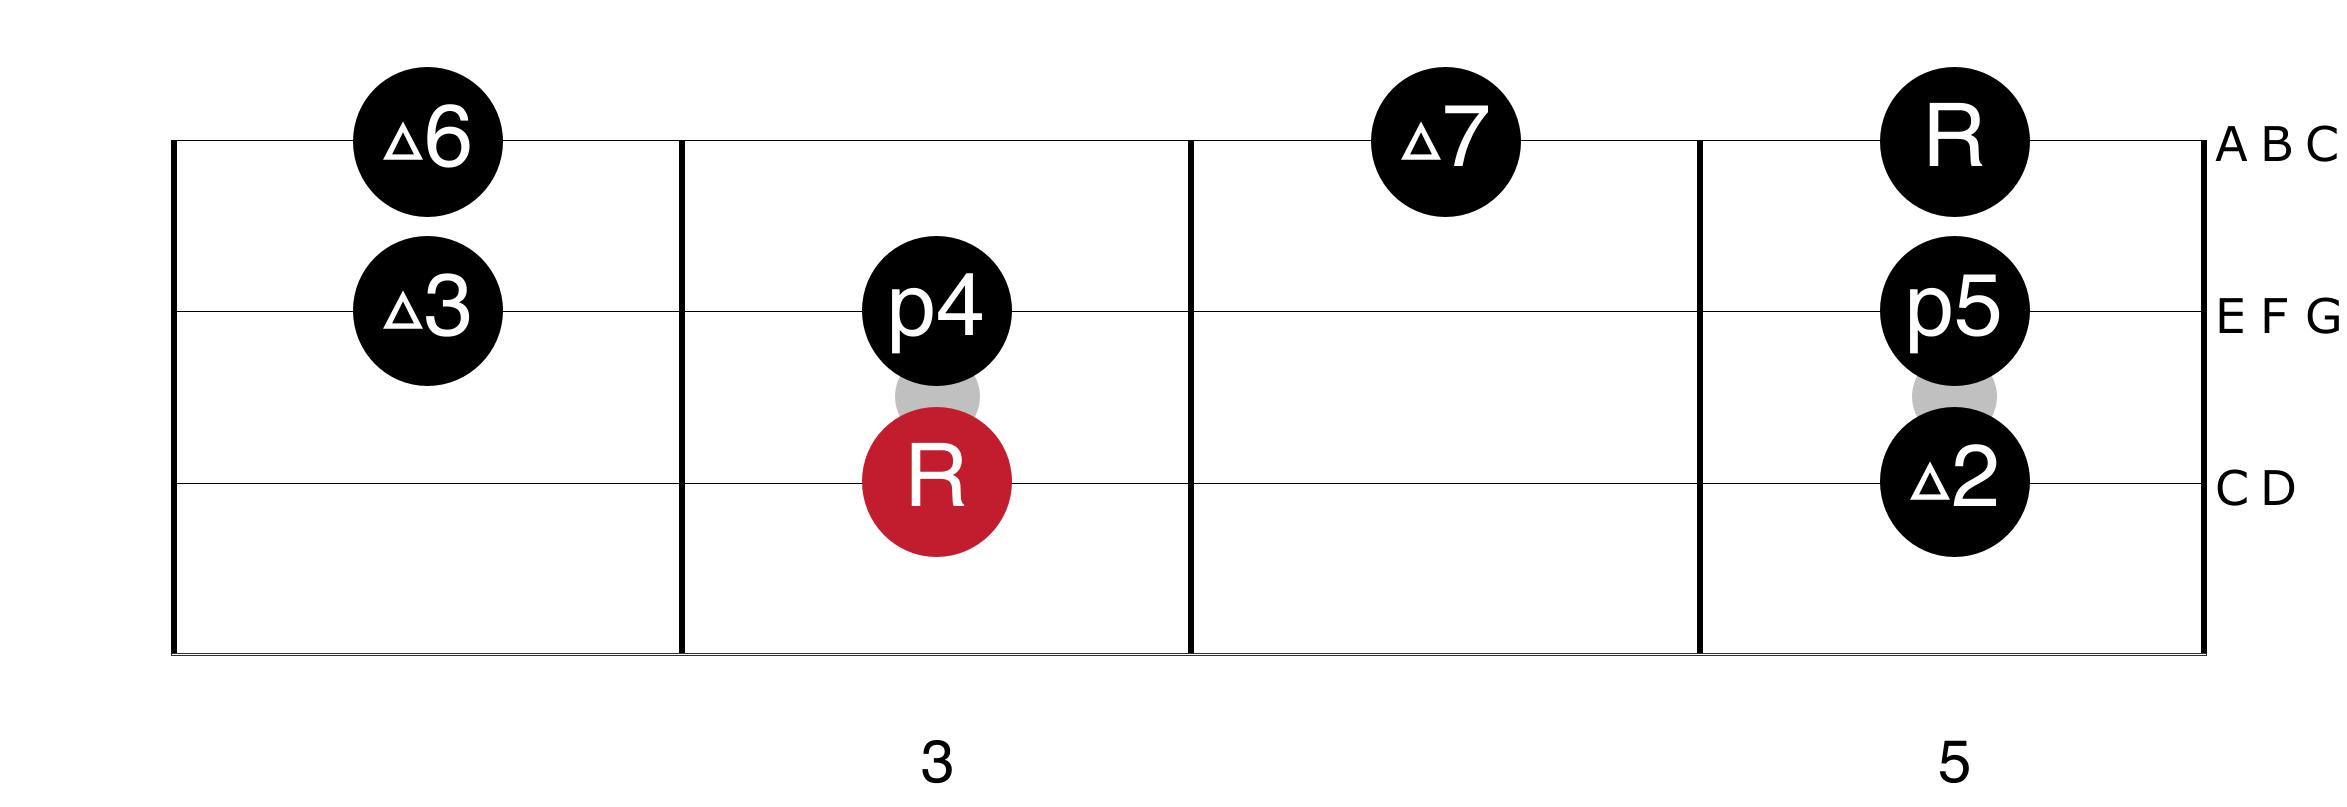 C Major Scales - Intervals